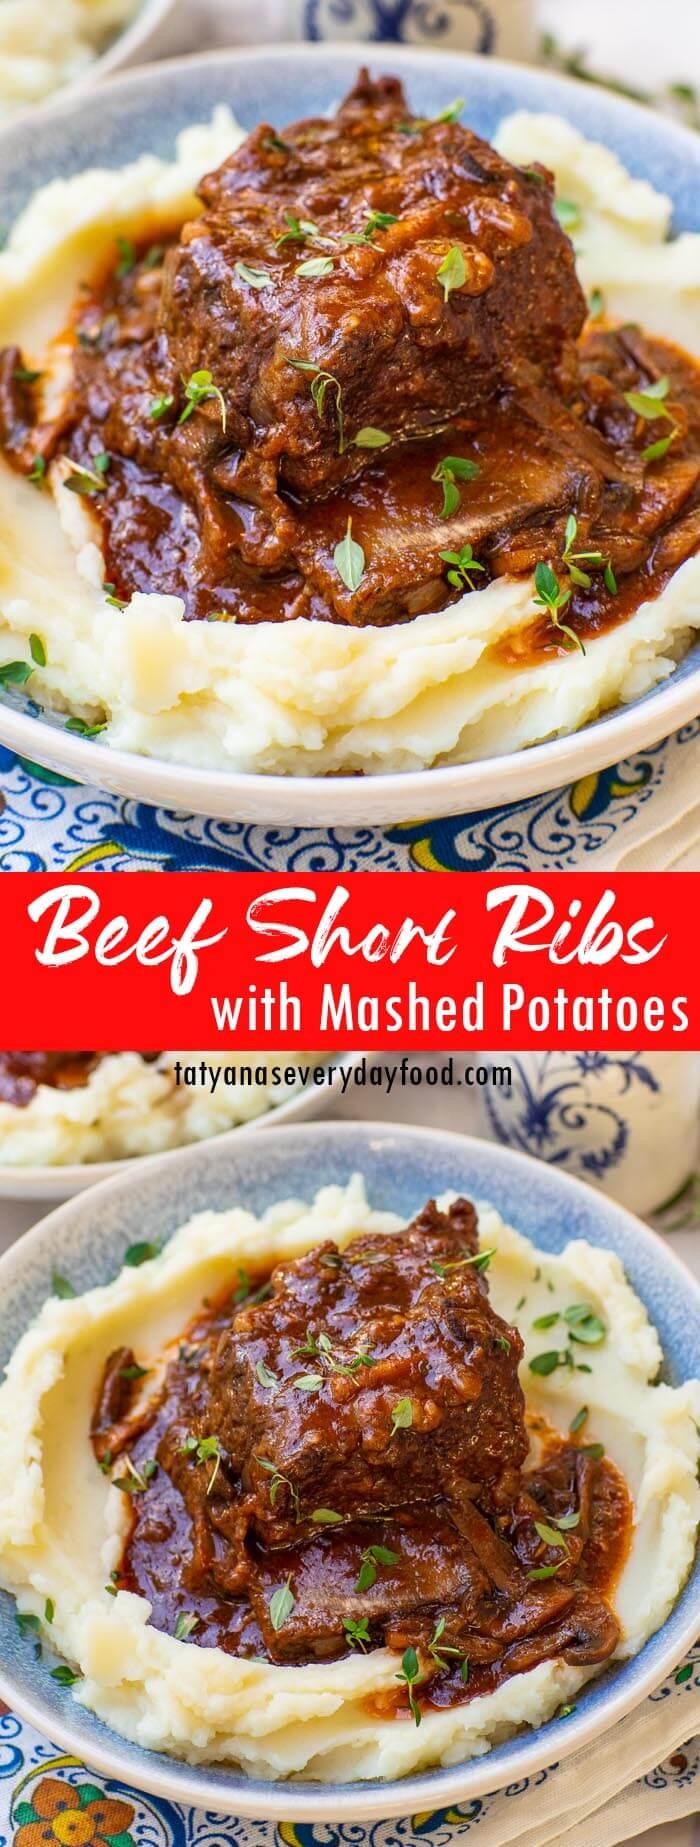 Braised Beef Short Ribs video recipe